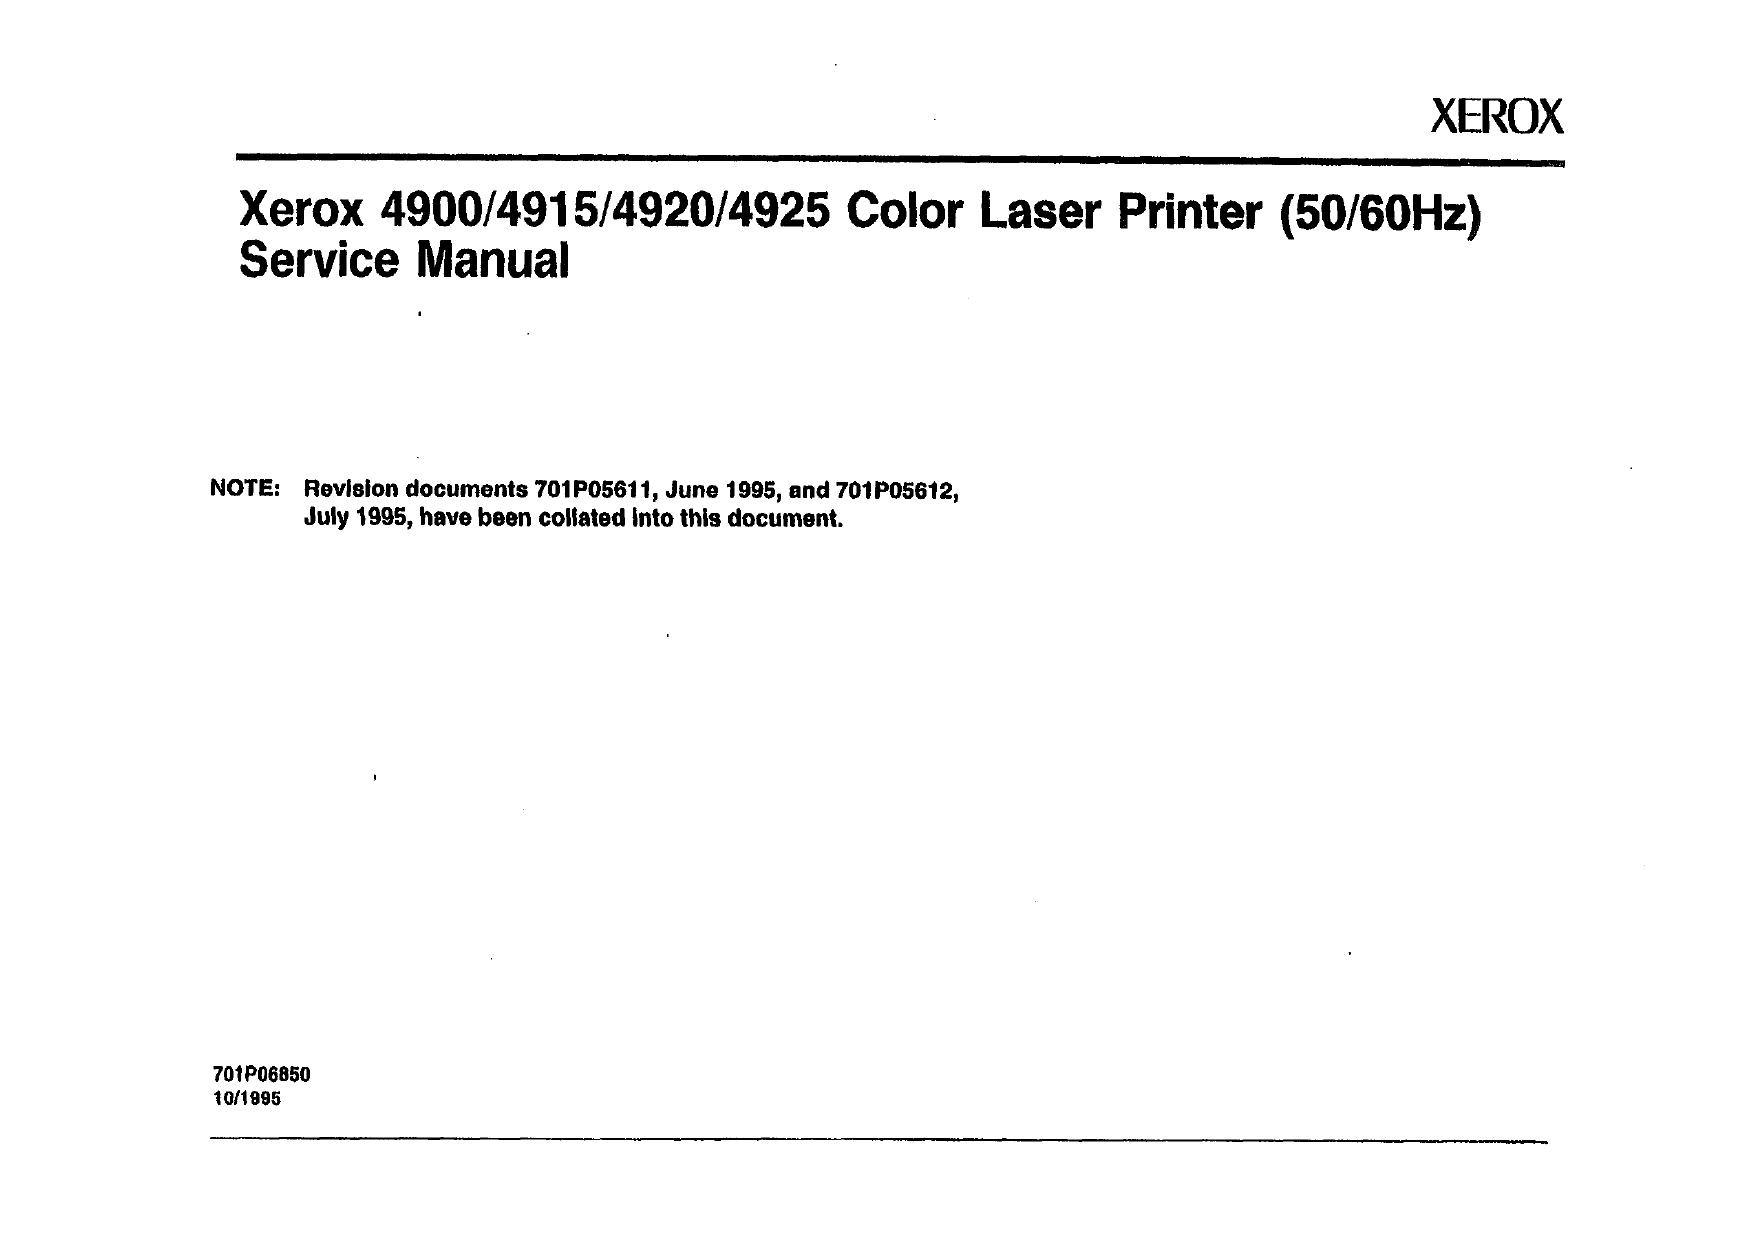 epson 4900 service manual pdf